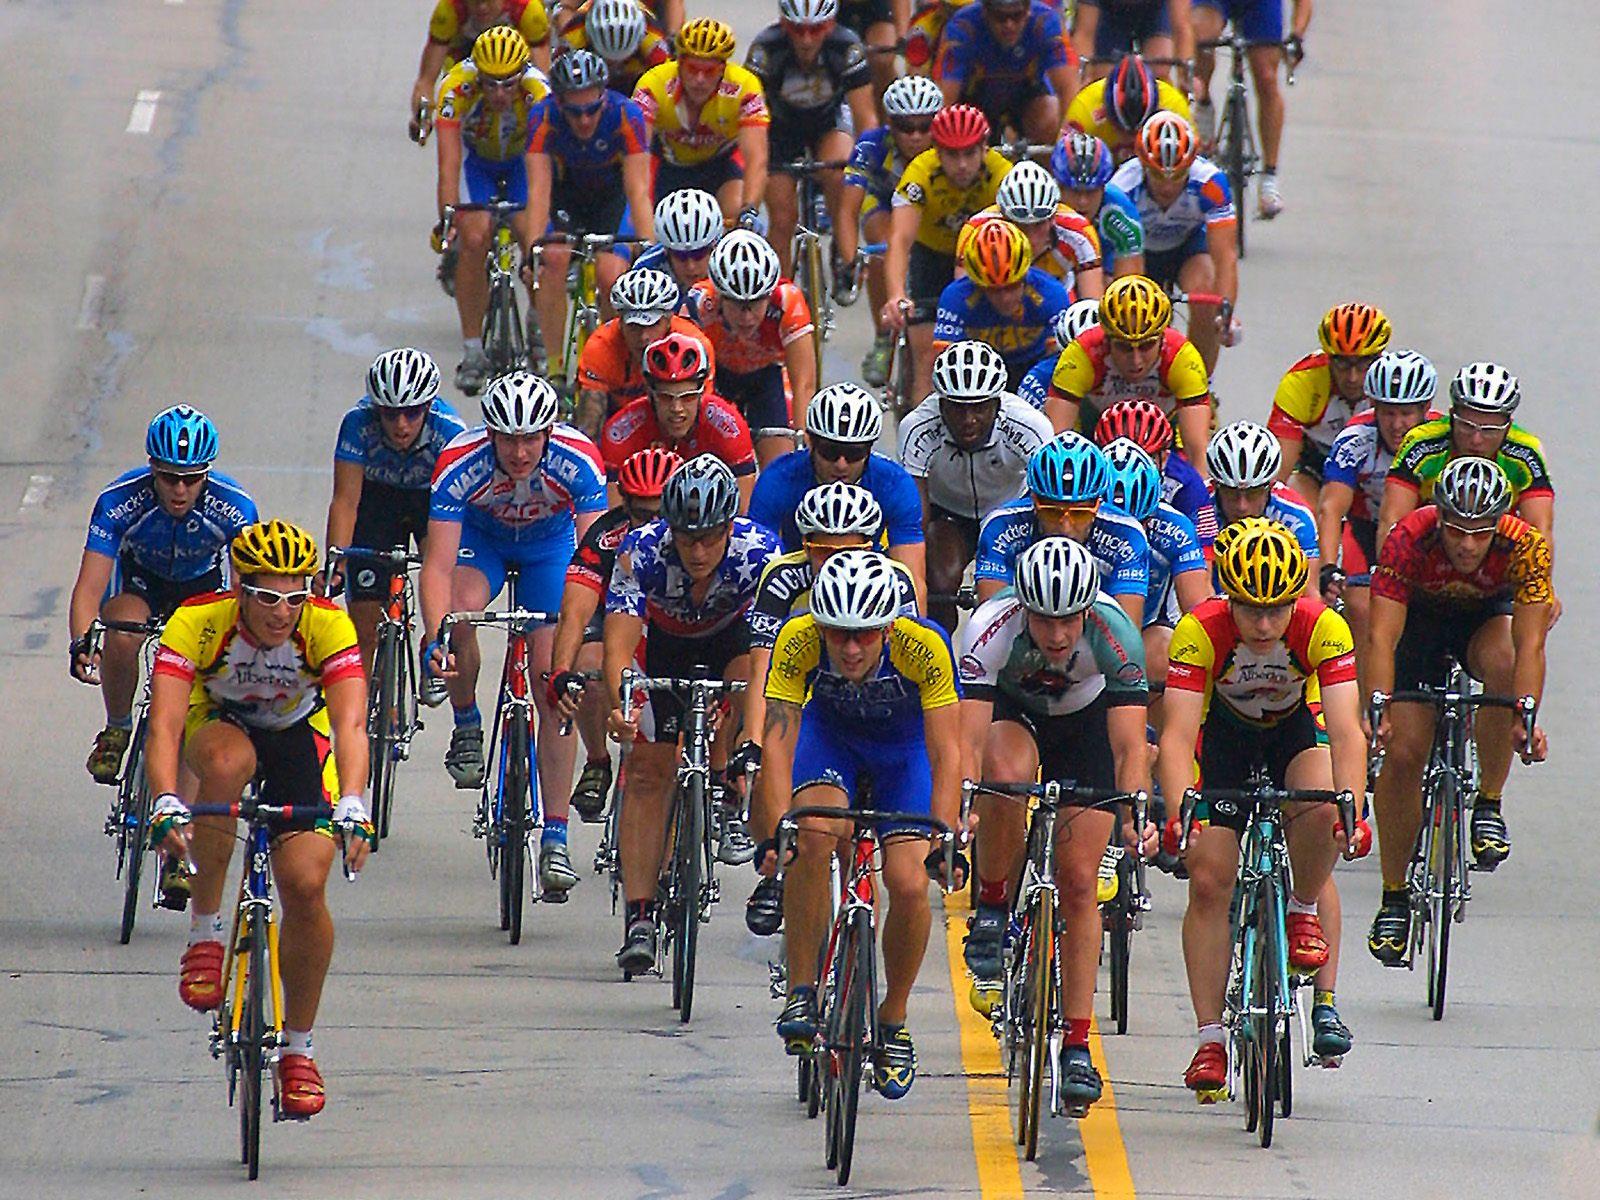 International Bike Race Downers Grove Illinois   Sports Photography 1600x1200